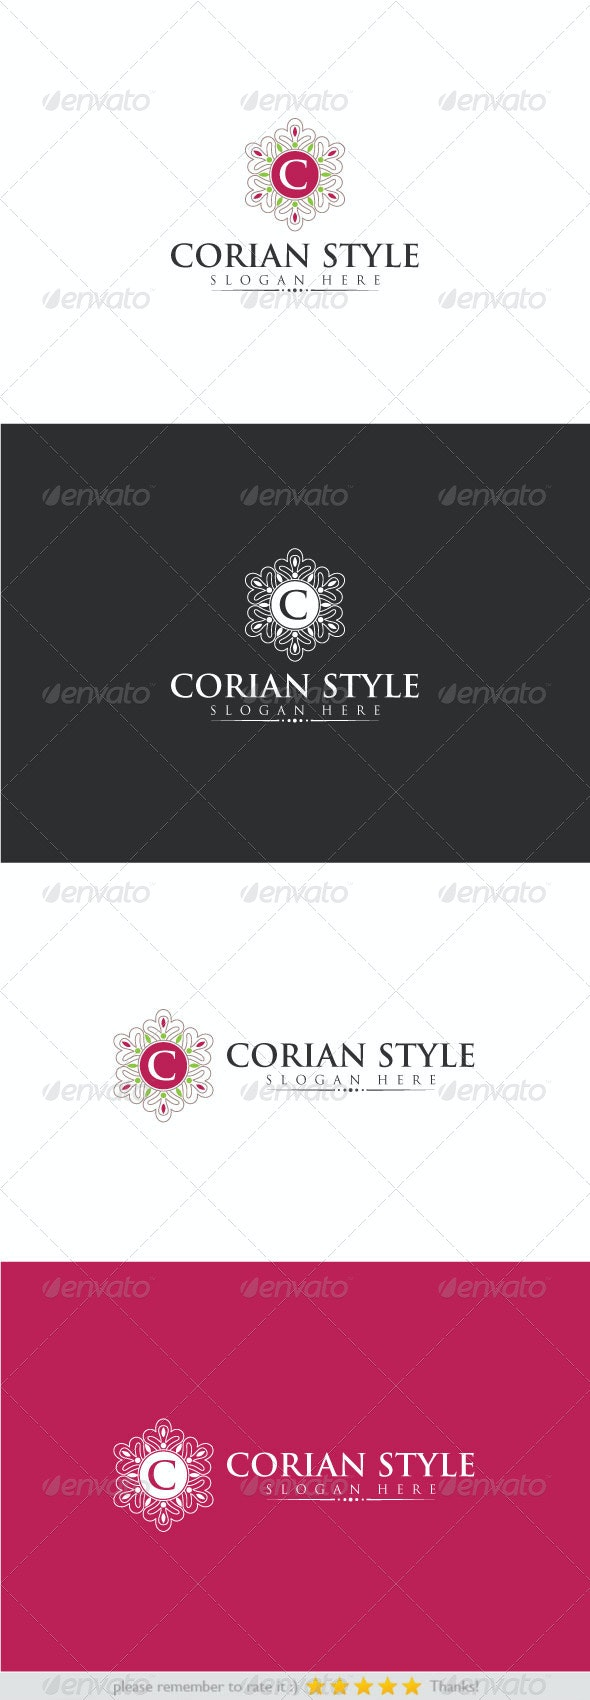 Corian Style - Crests Logo Templates